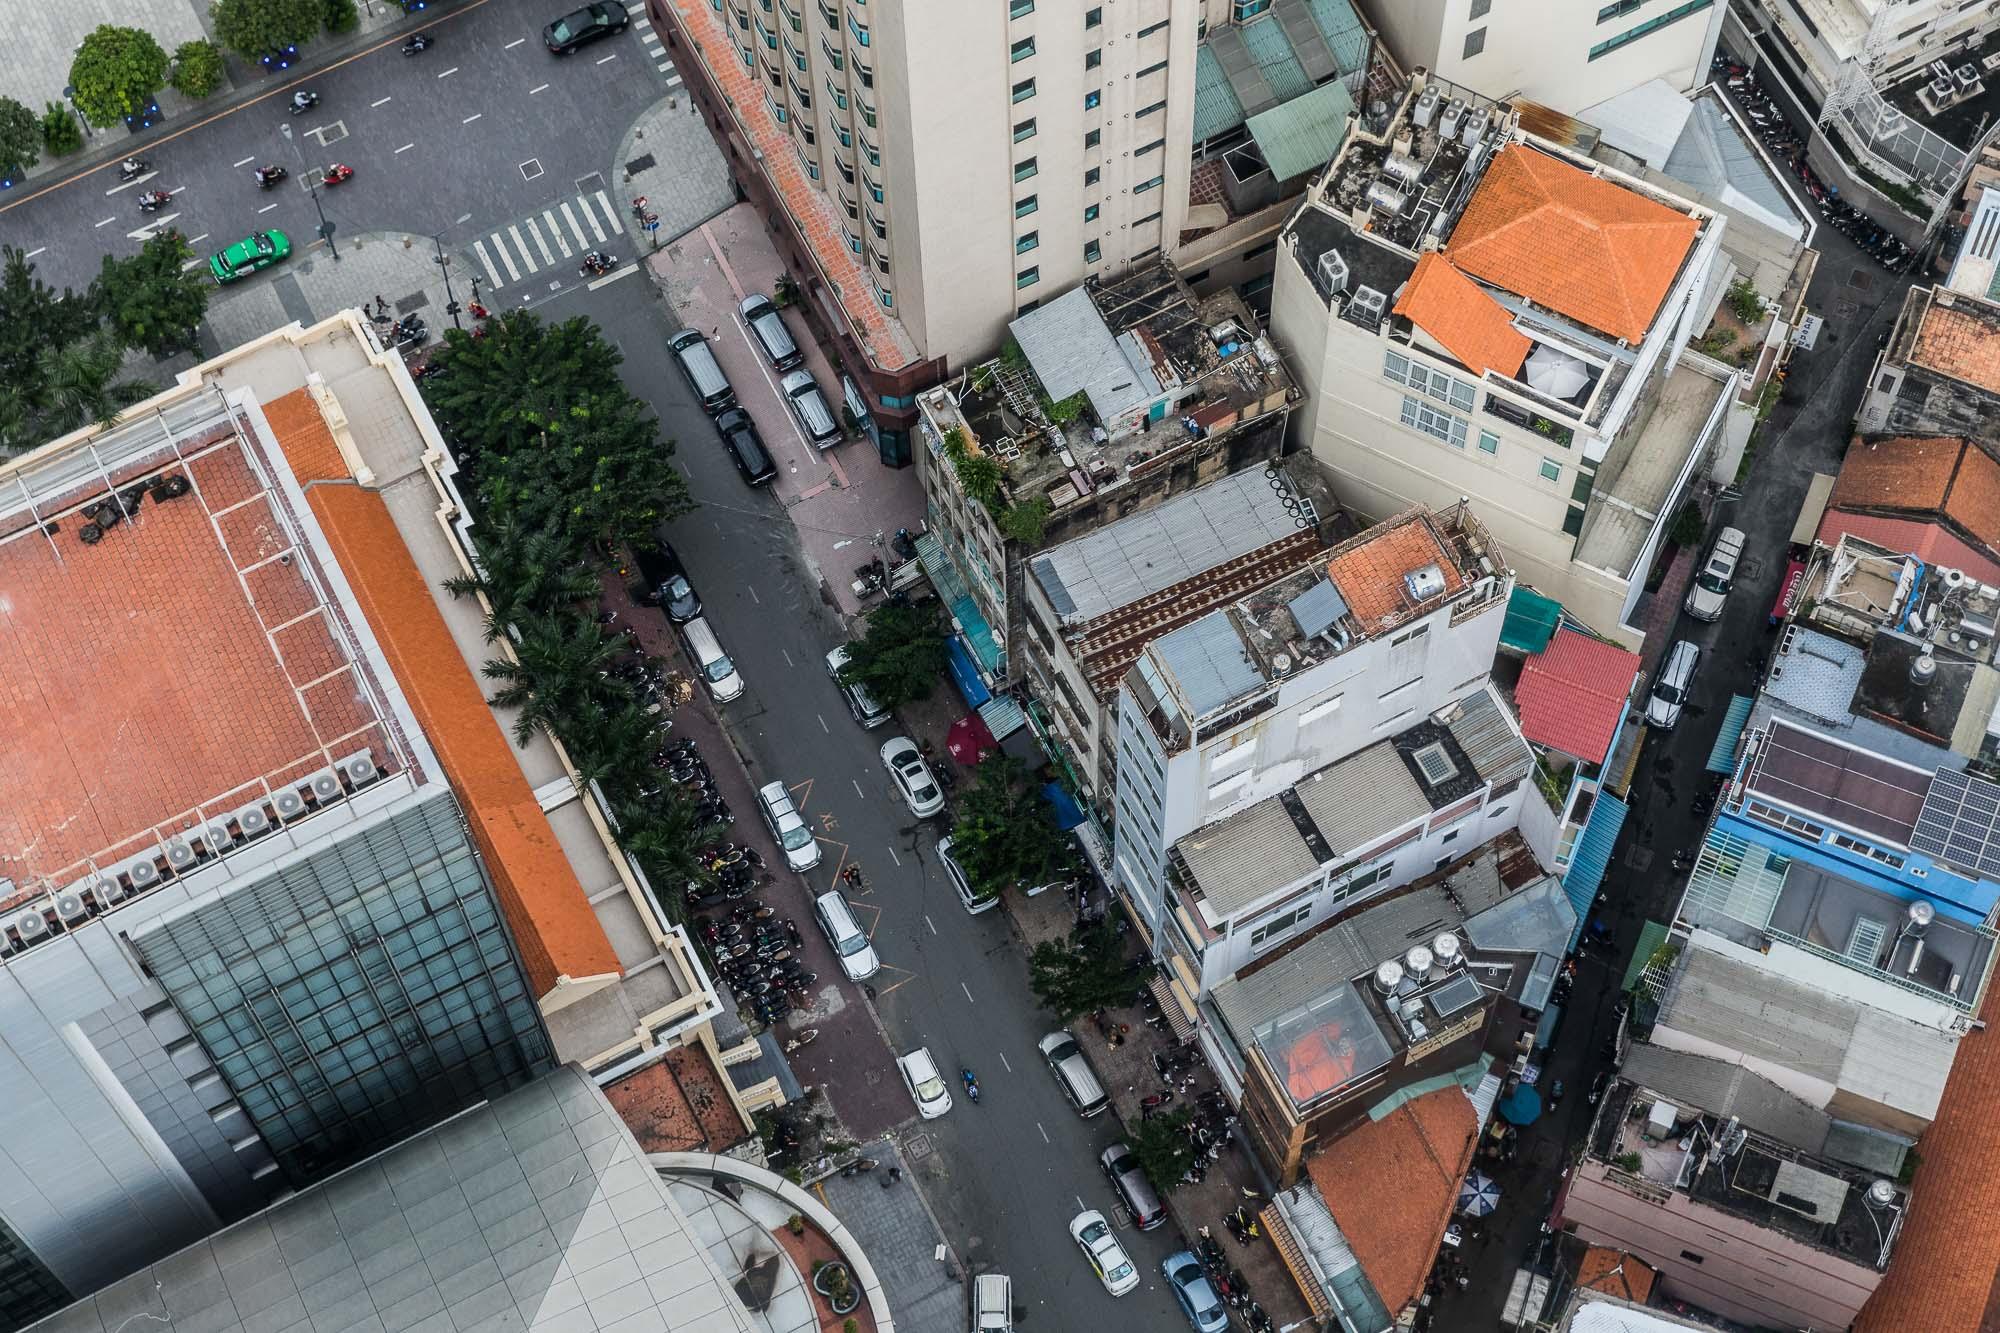 vietnam_2016_hcmc_jusmedic_141